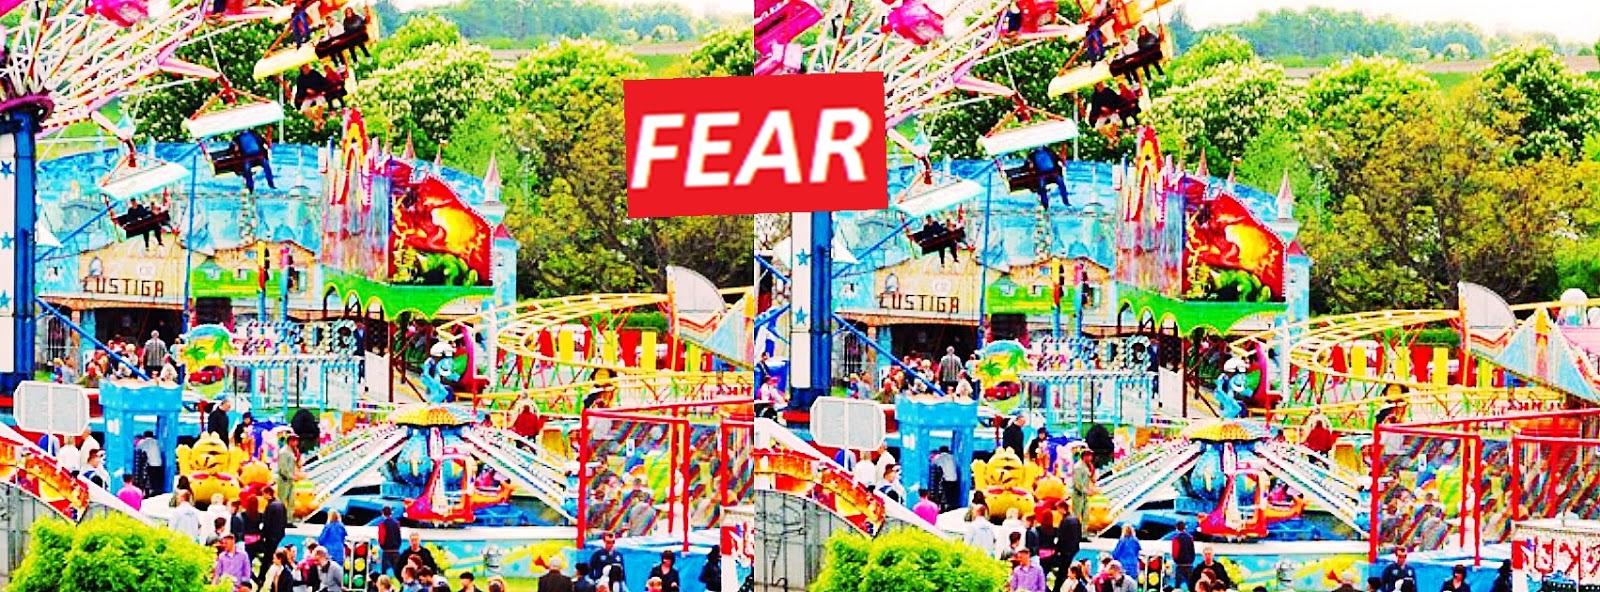 FEAR | Agnesblog